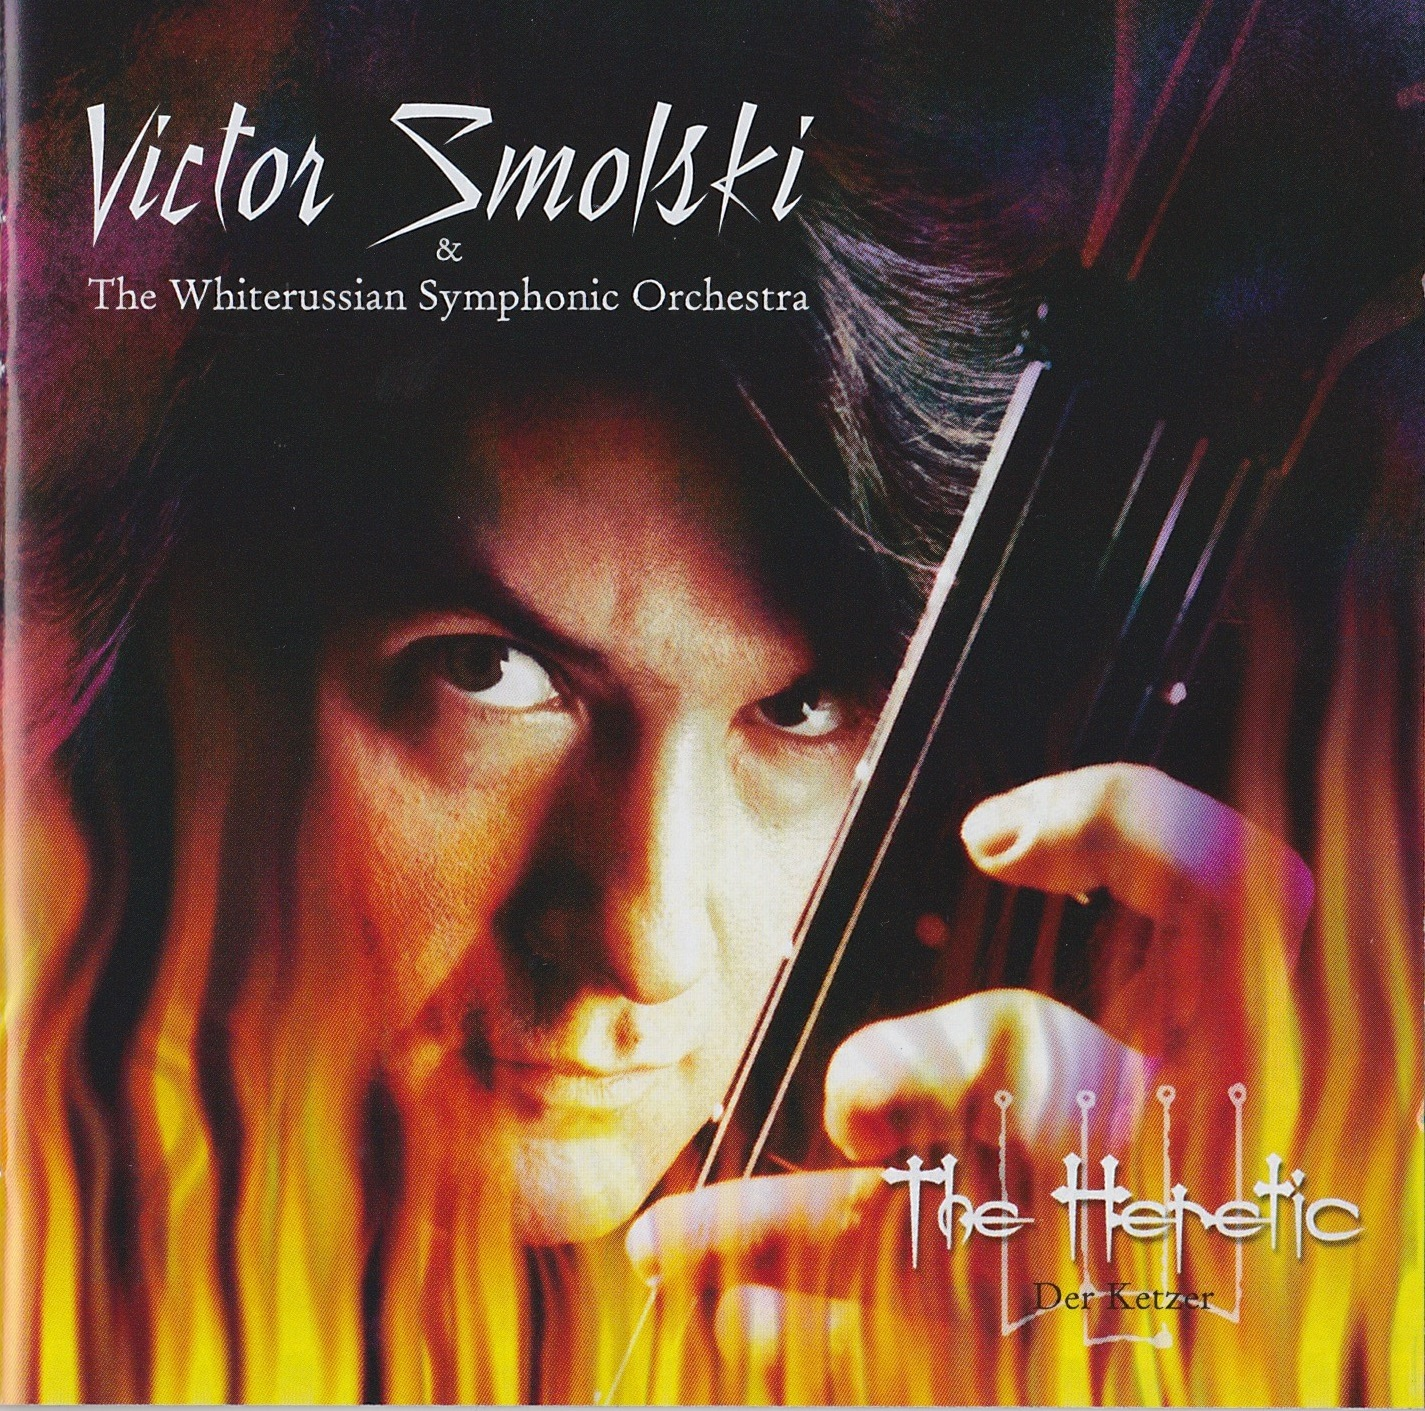 Victor Smolski — The Heretic (2000)